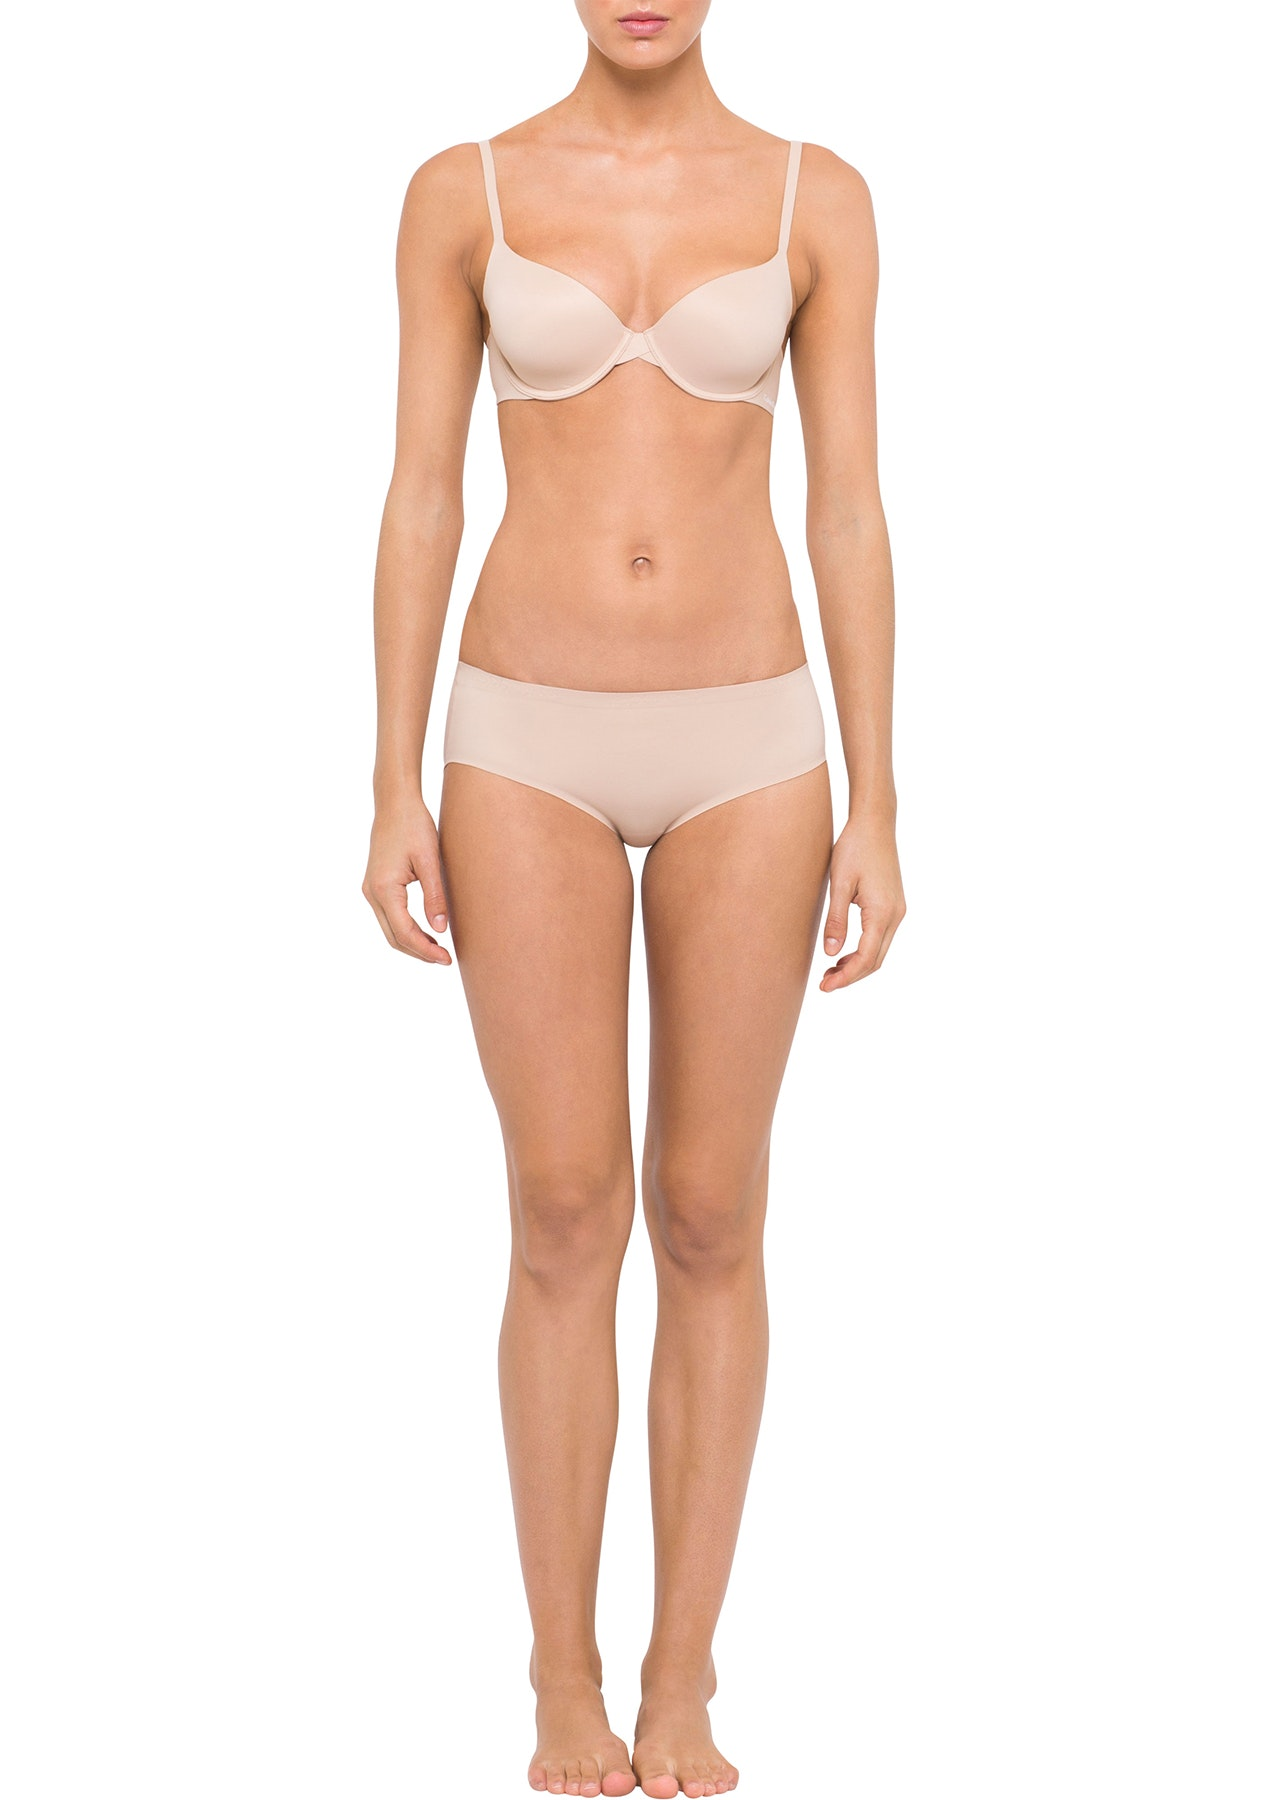 Calvin Klein  - PERFECTLY FIT, MODERN T-SHIRT BRA - BARE